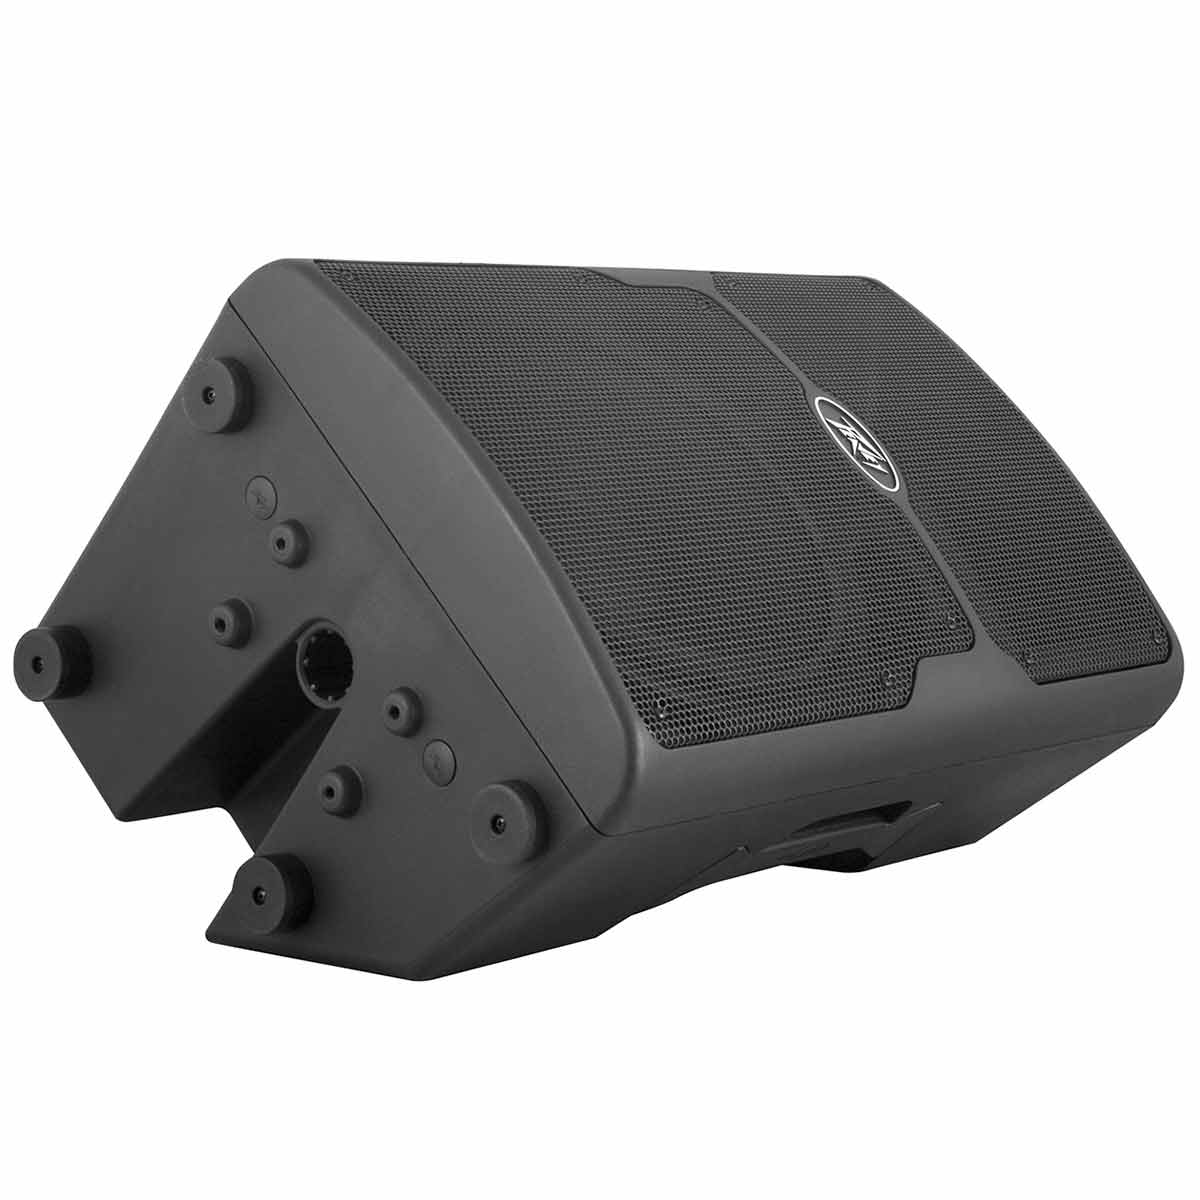 PVXp15 - Caixa Ativa 800W PVXp 15 - Peavey